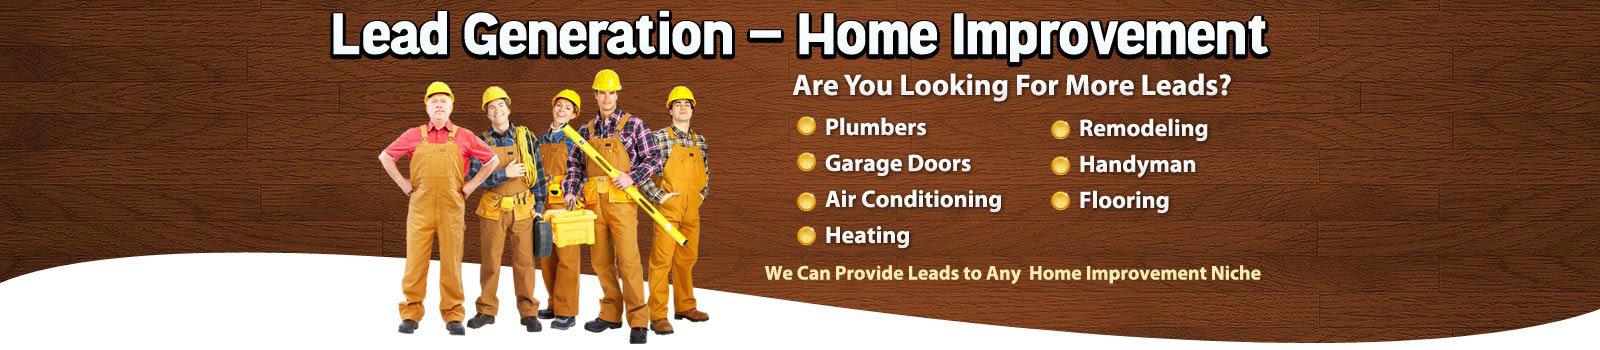 Home-Improvement-Lead-Gener